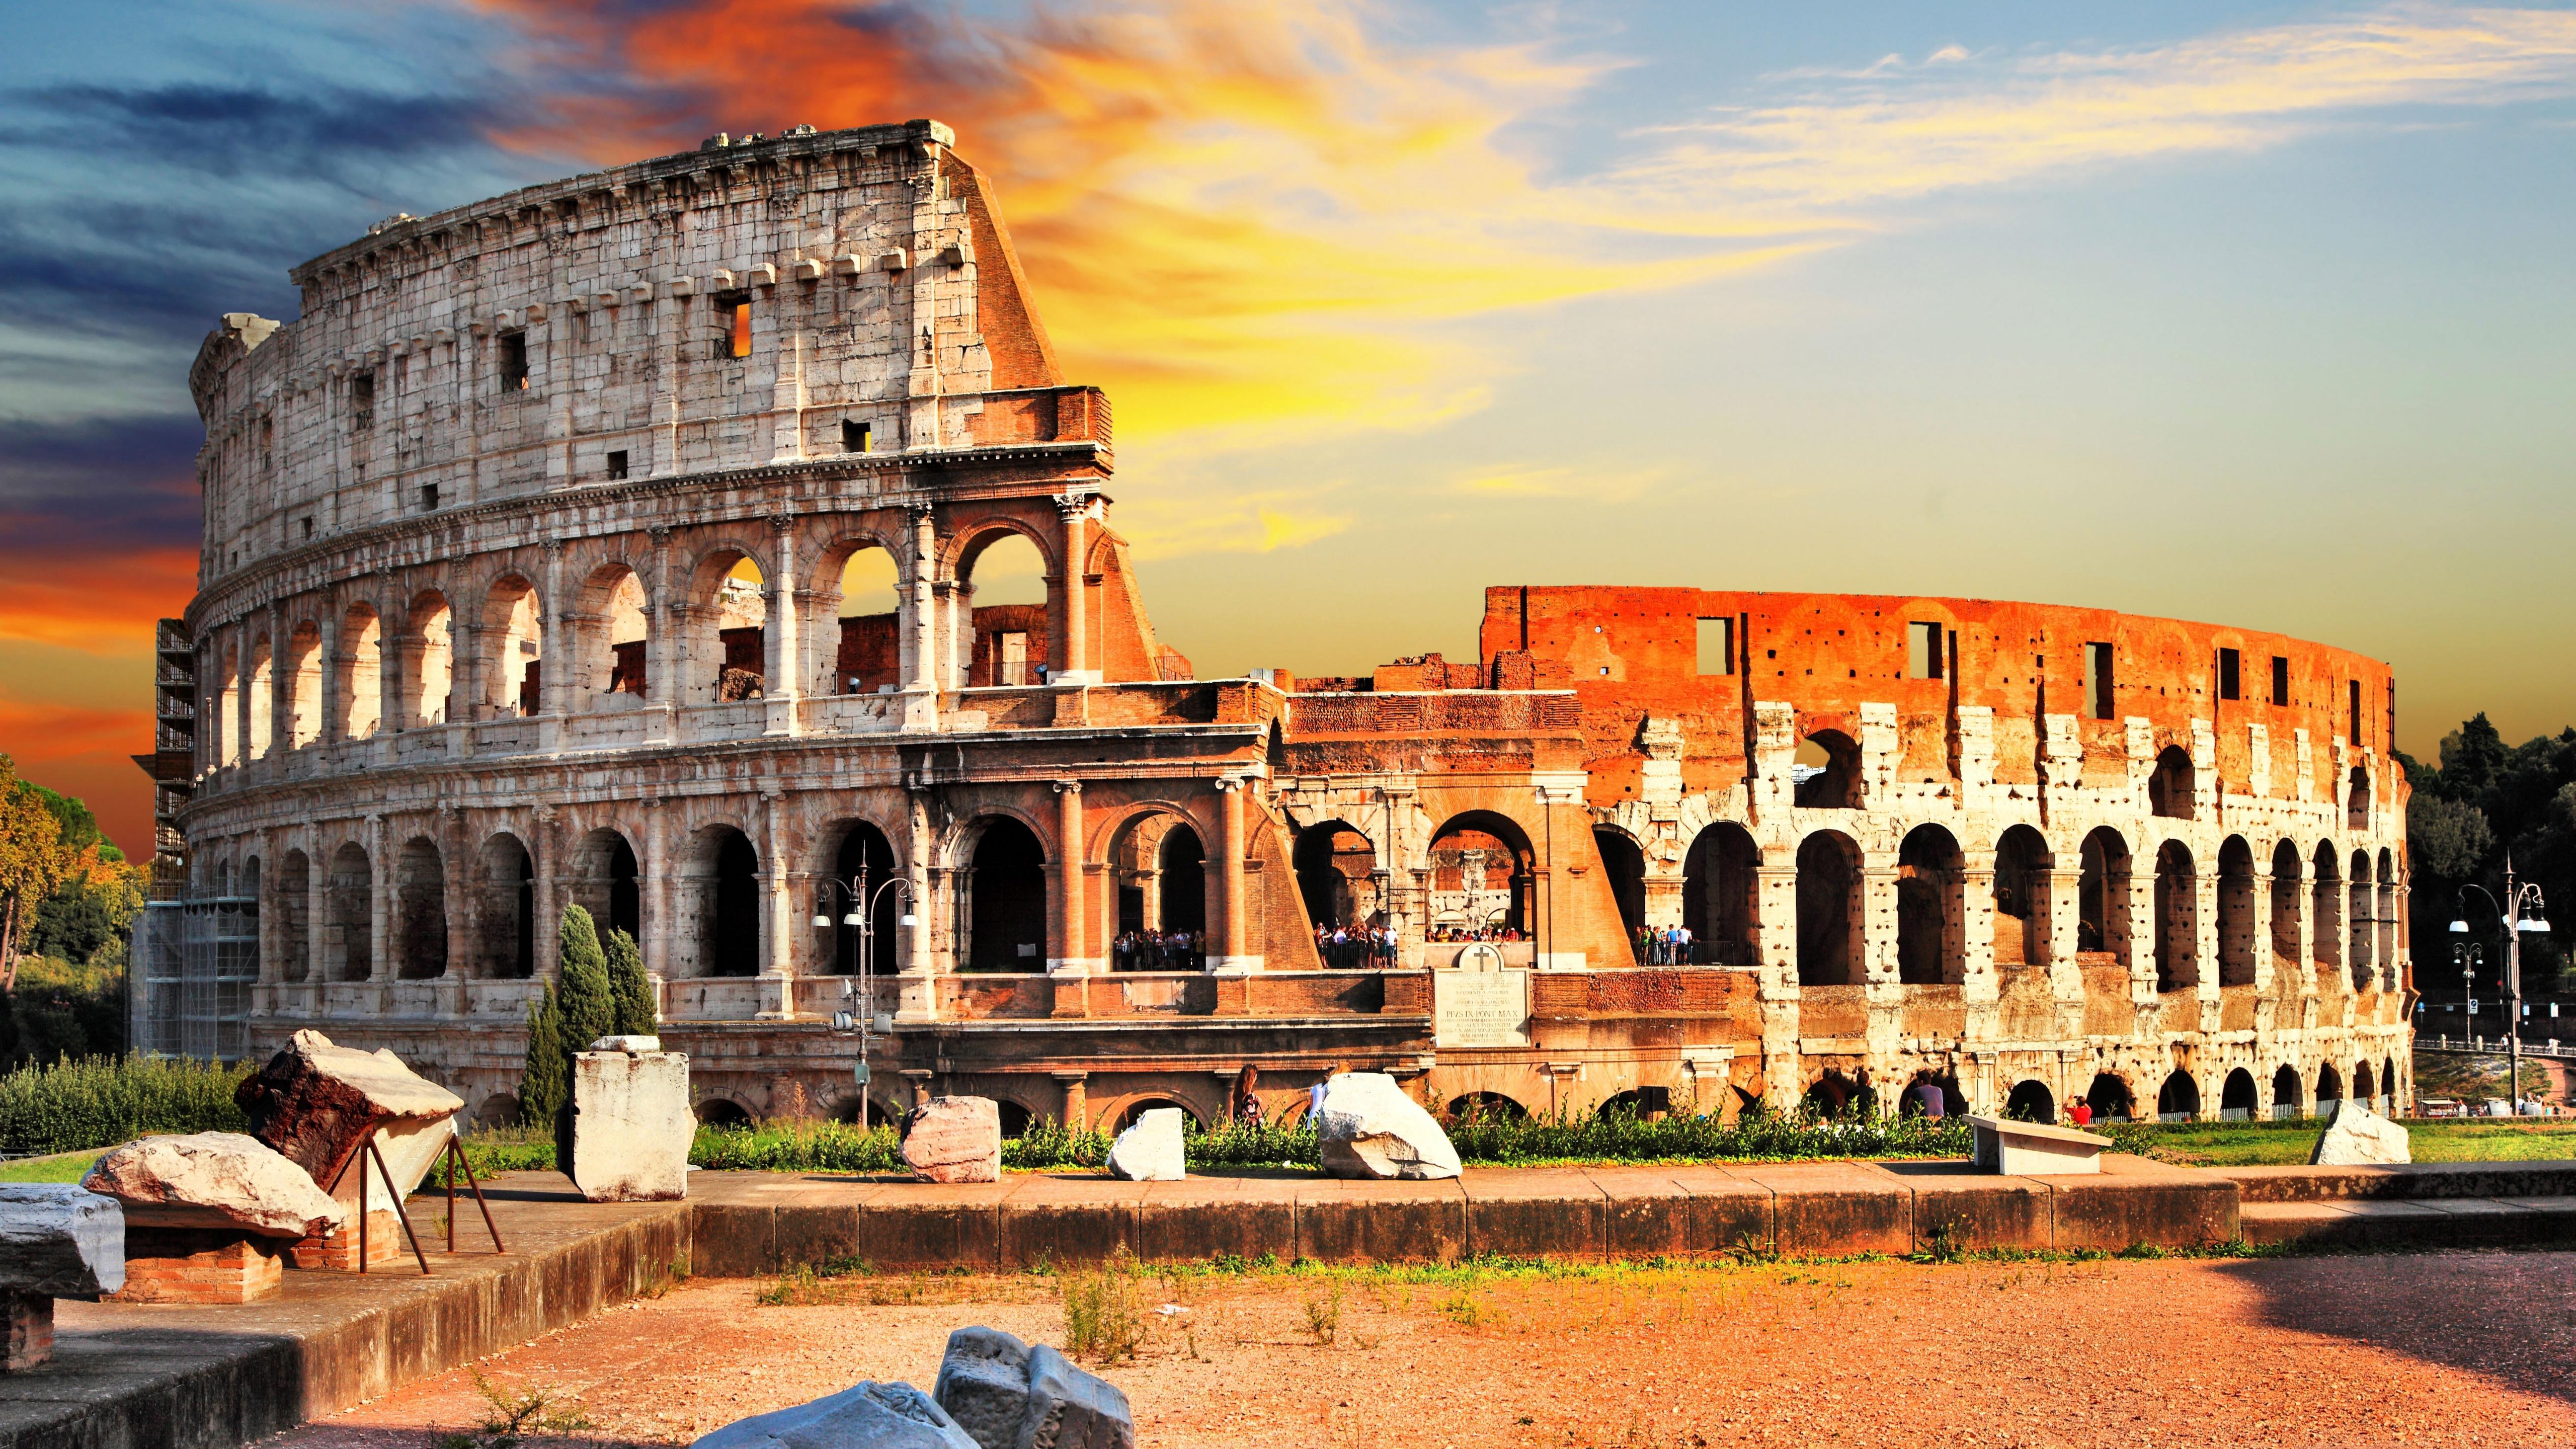 Colosseum (Rome, Italy) wallpaper